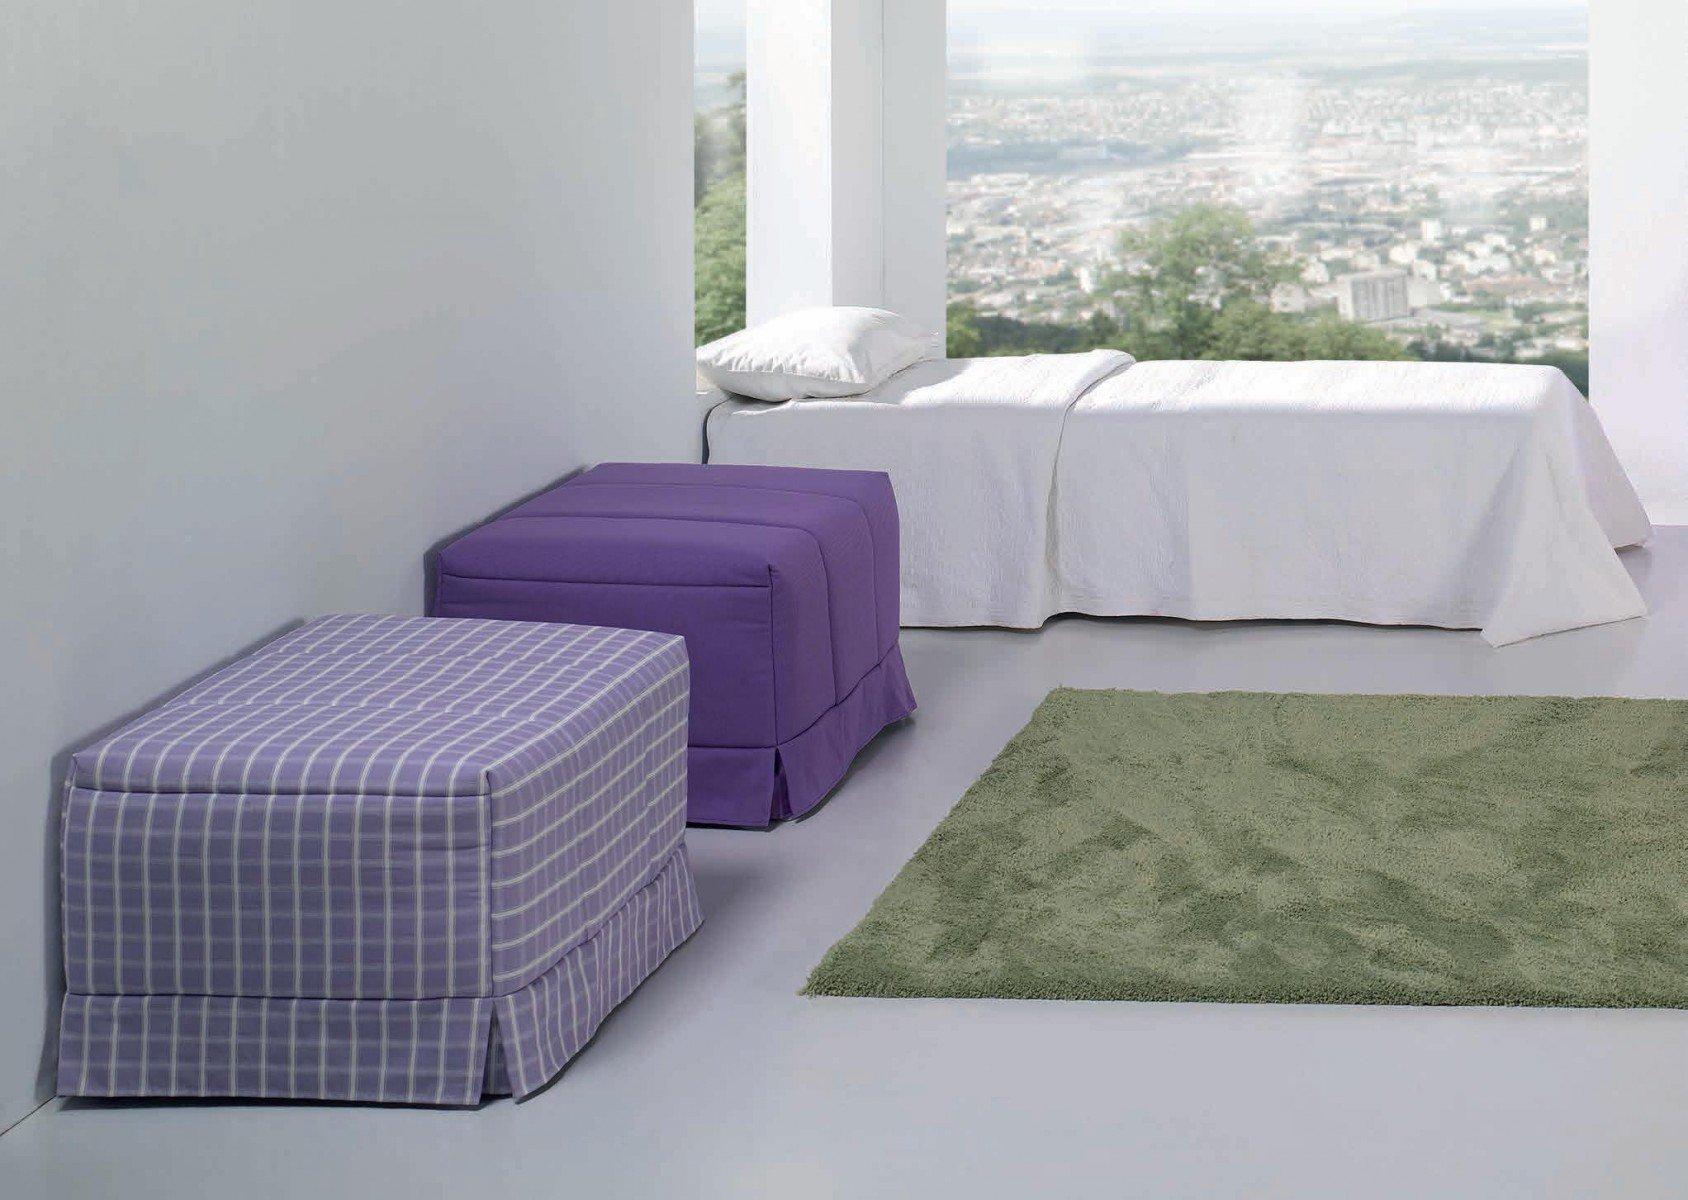 Muebles cama baratos 20170905170817 for Sofa cama puff barato